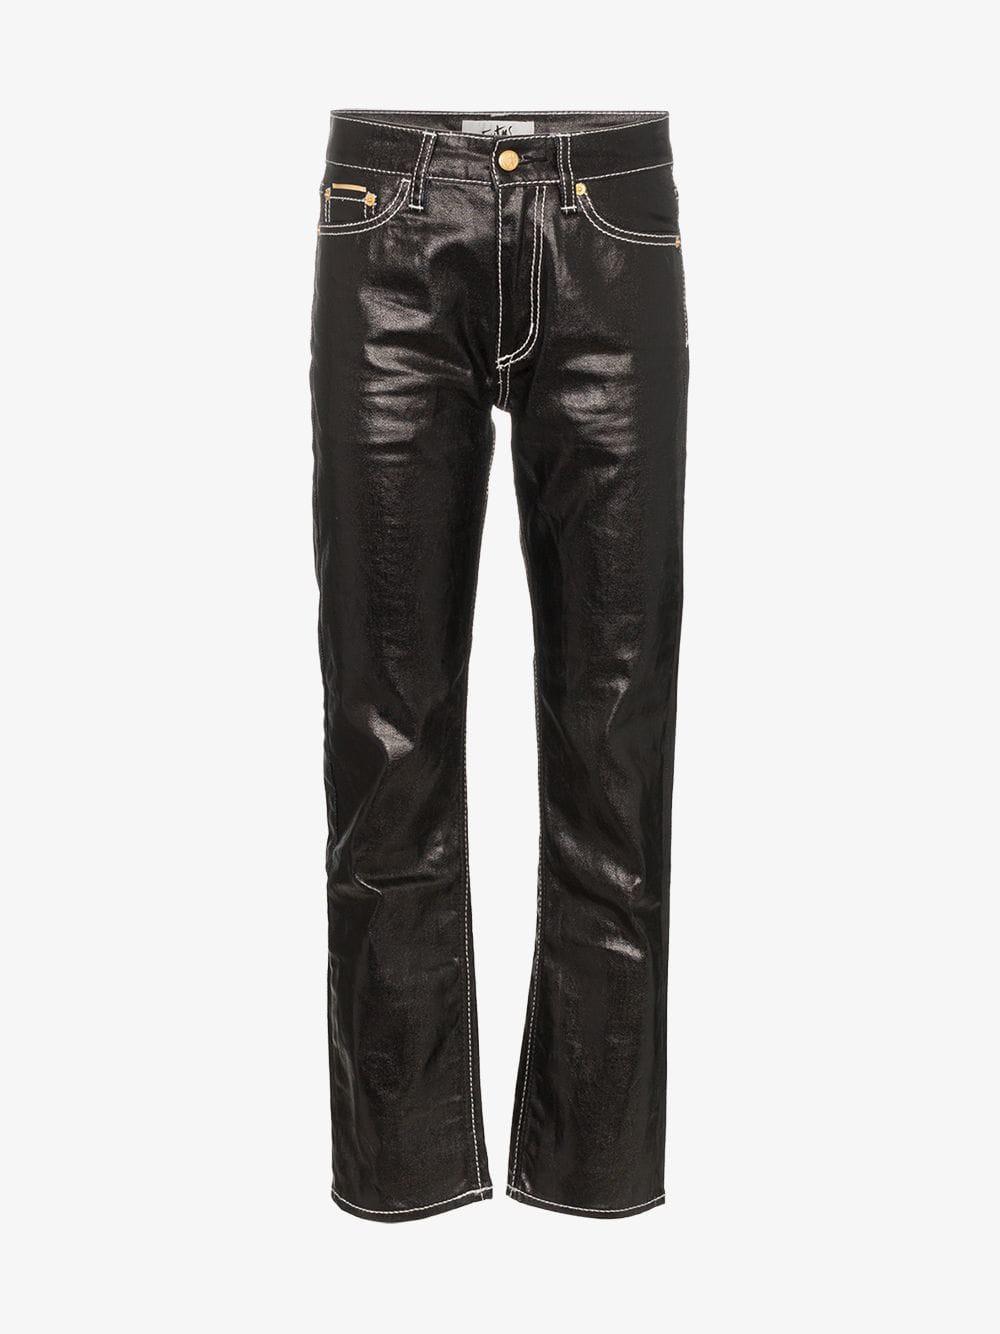 Eytys cypress straight leg jeans in black